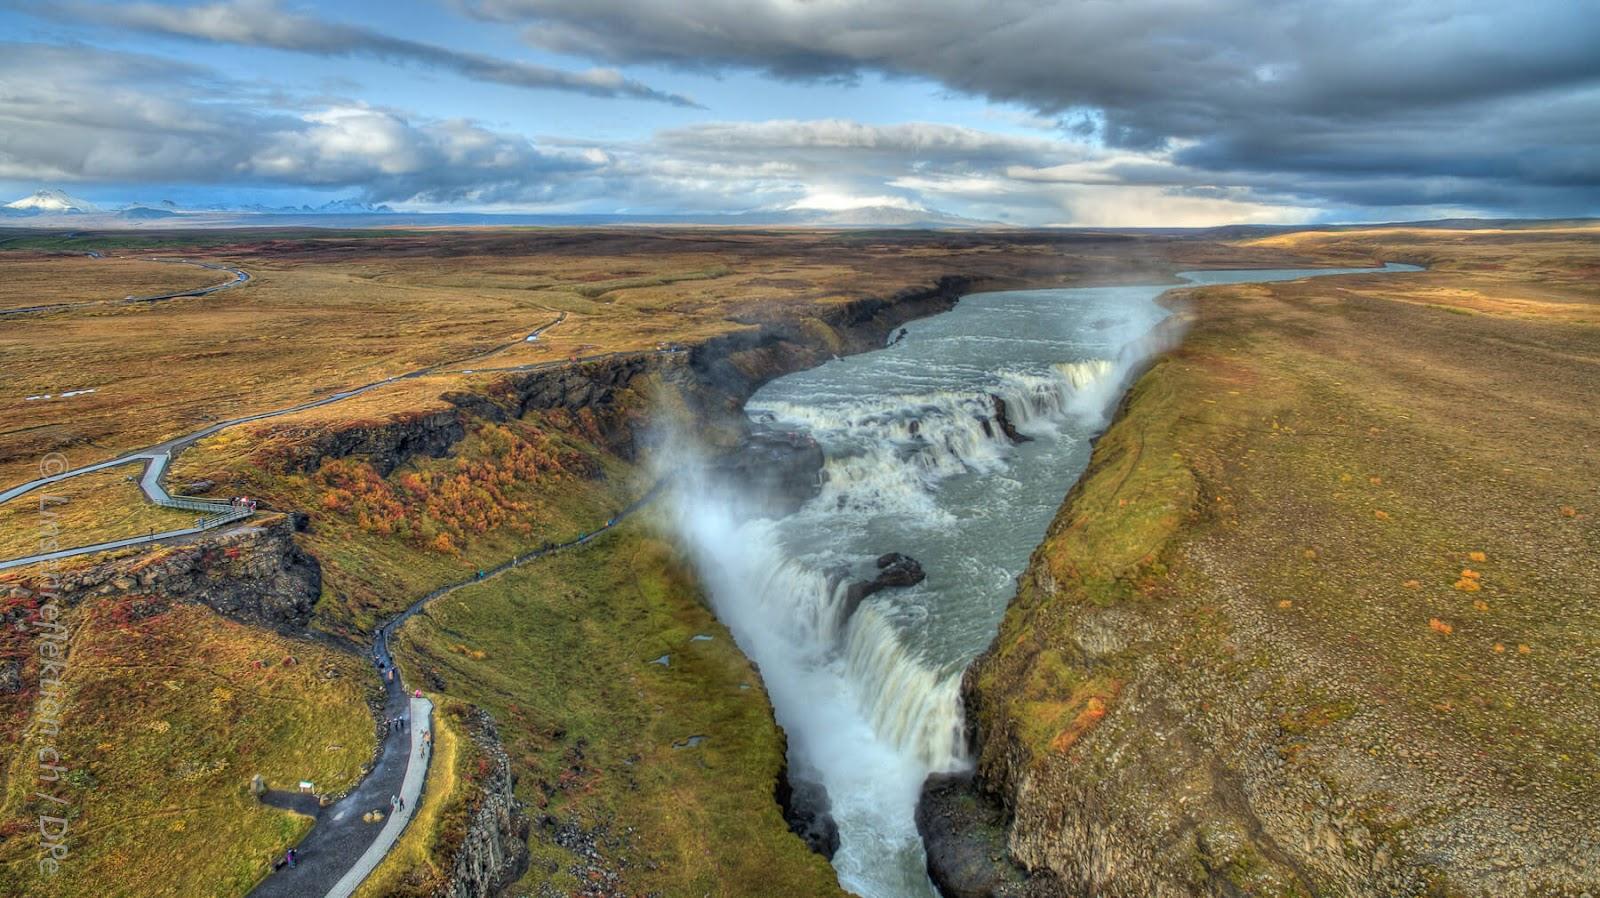 gulfoss waterfalls, best waterfall in iceland, golden circle